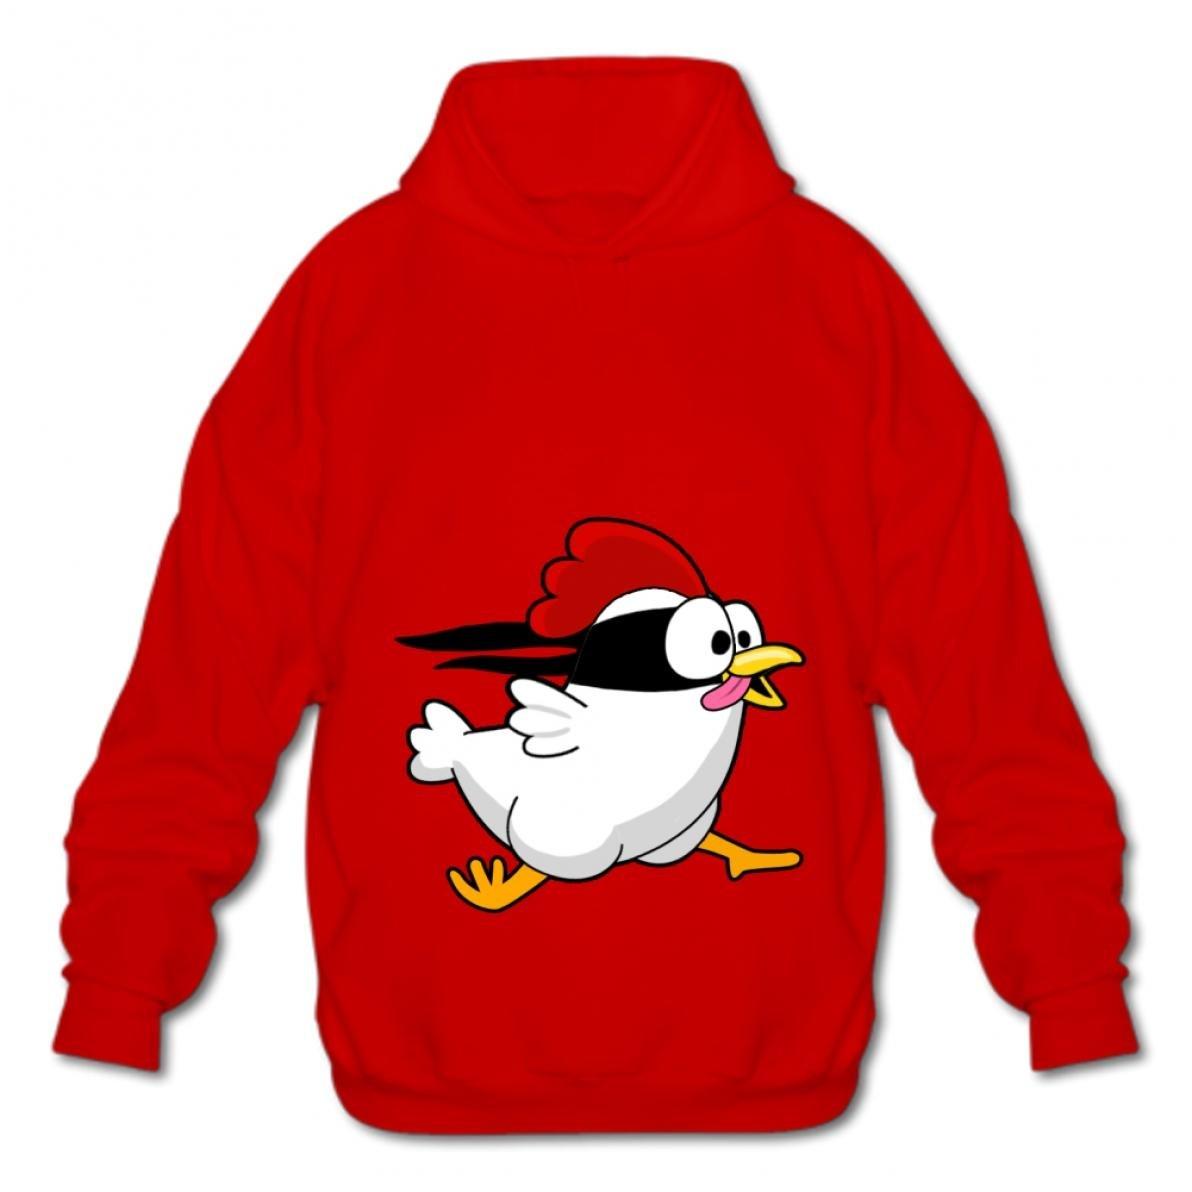 Tngjijish Hooded Sweatshirt Style Cotton Pullover Fashion Hoodies-03 Cartoon Chicken sqxy Men